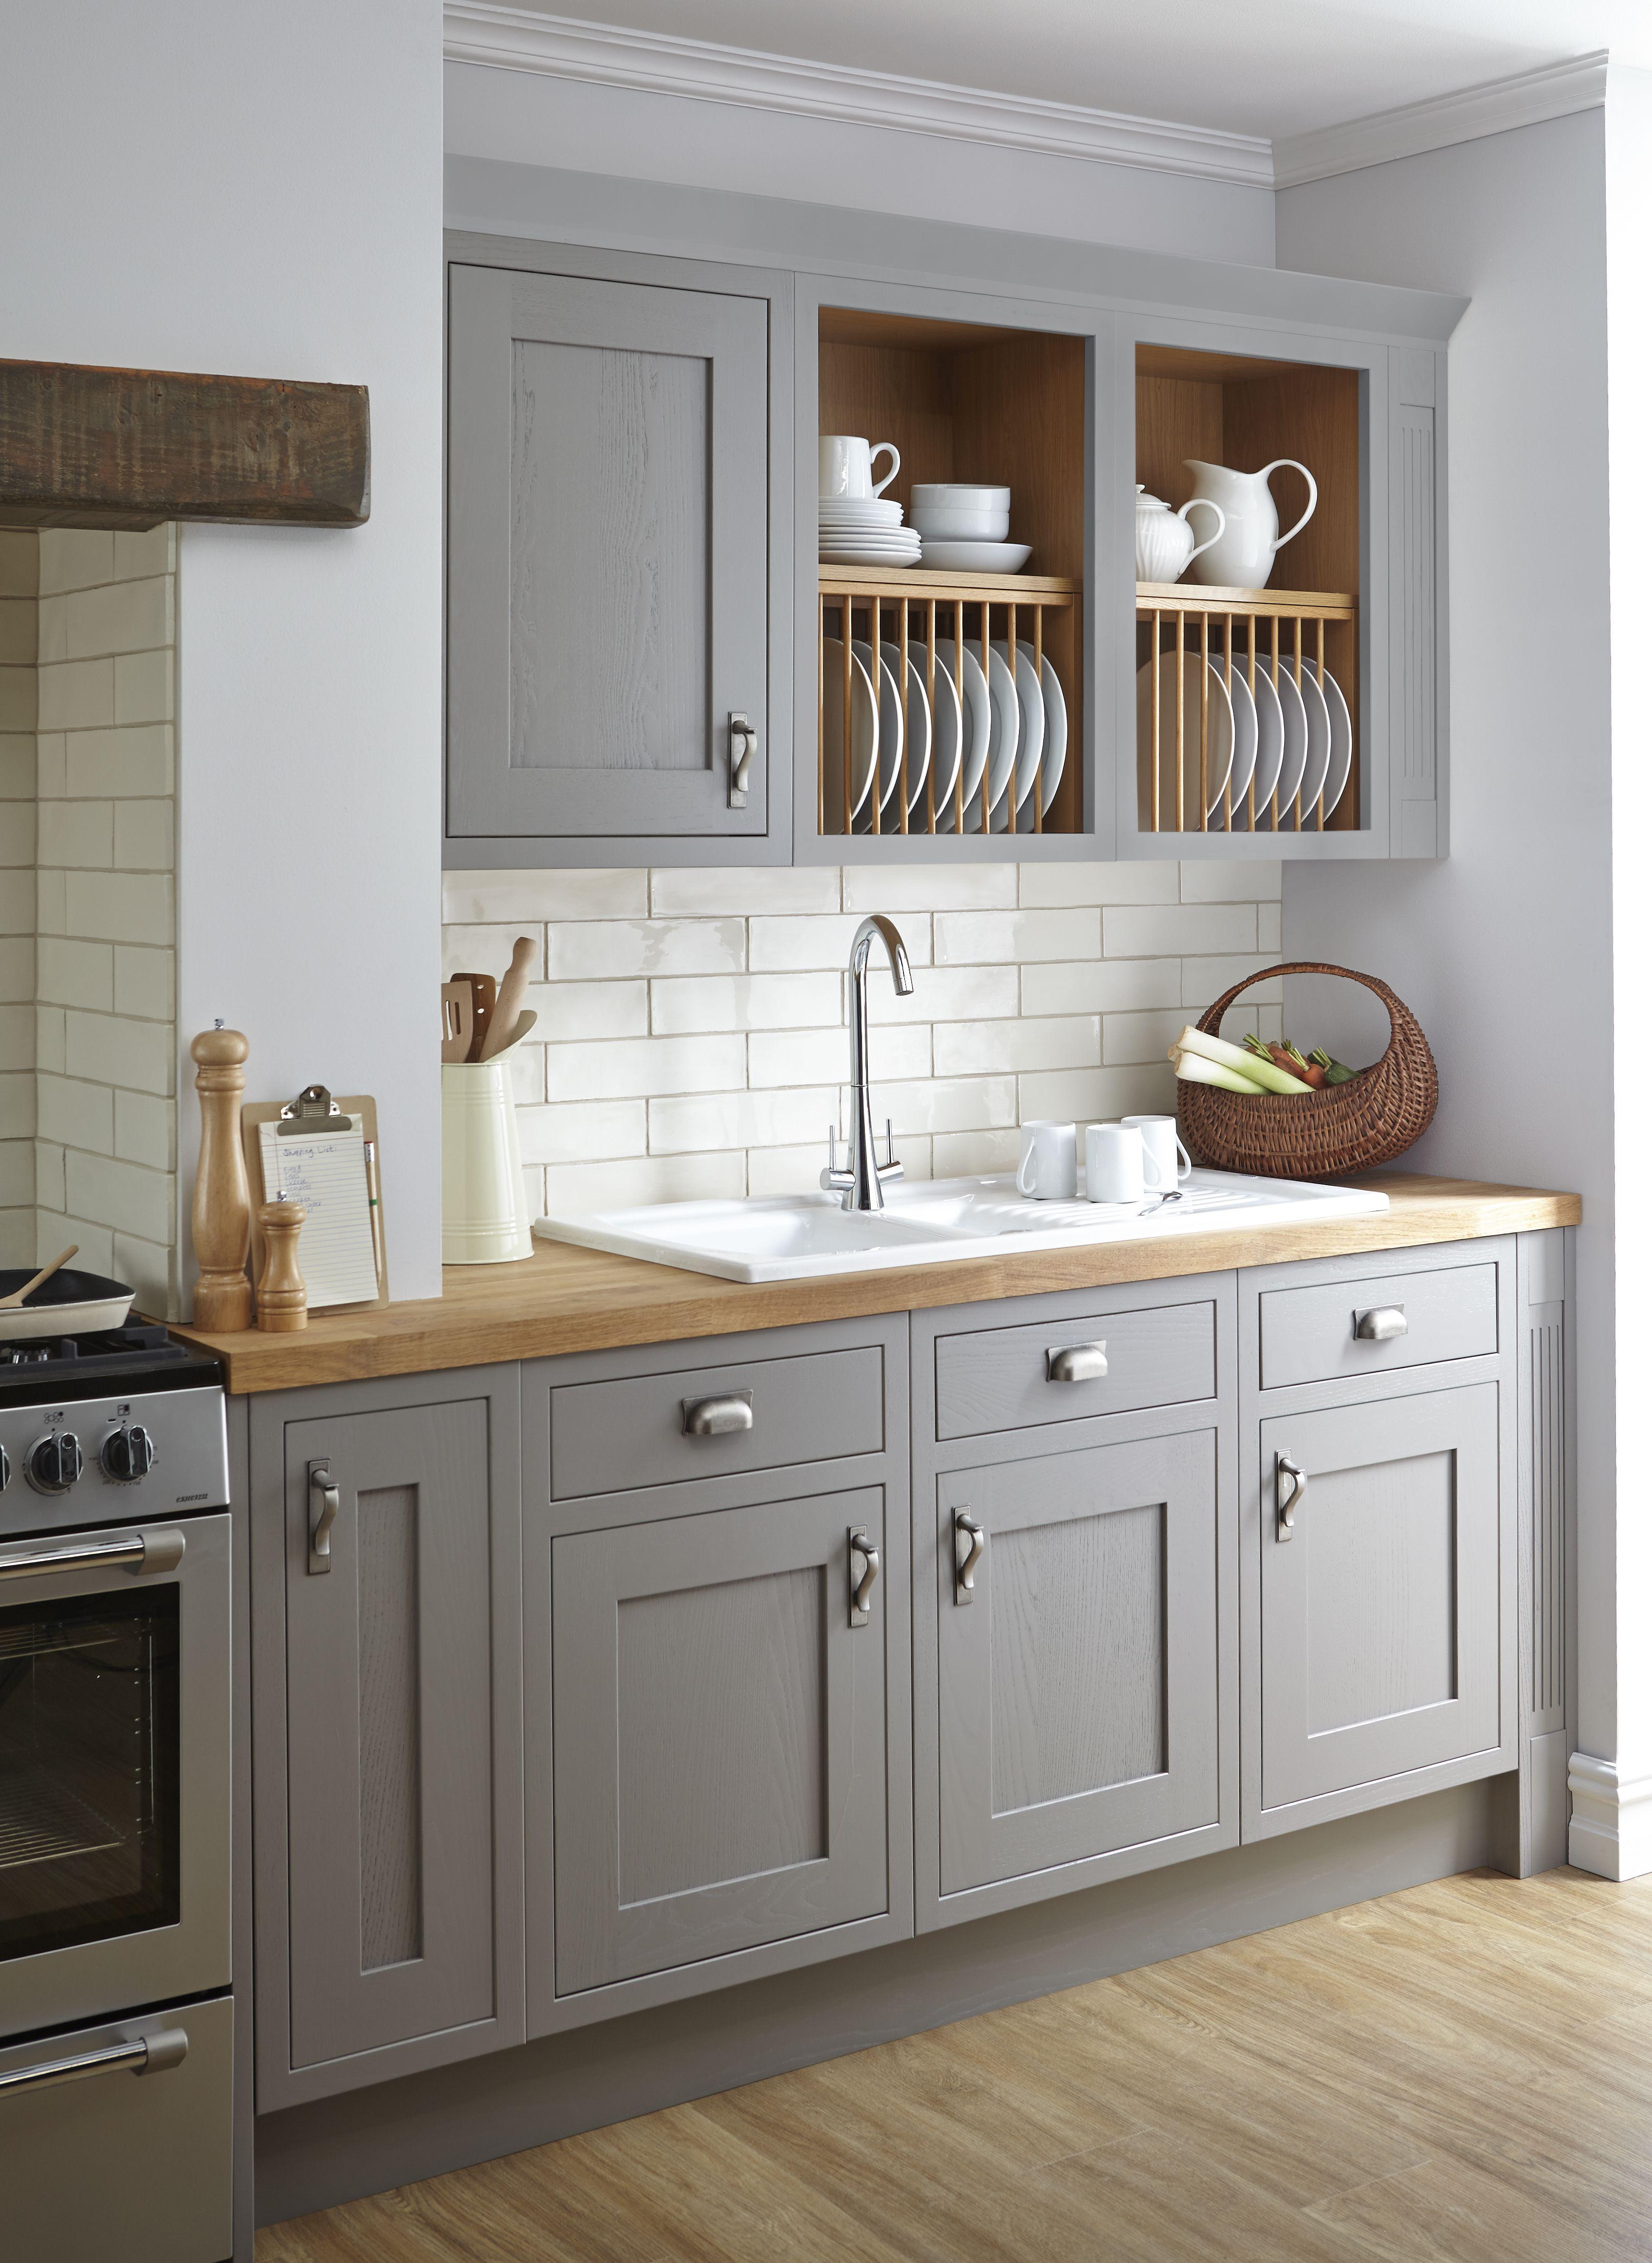 B Q Replacement Kitchen Cabinet Doors Scandlecandle Com